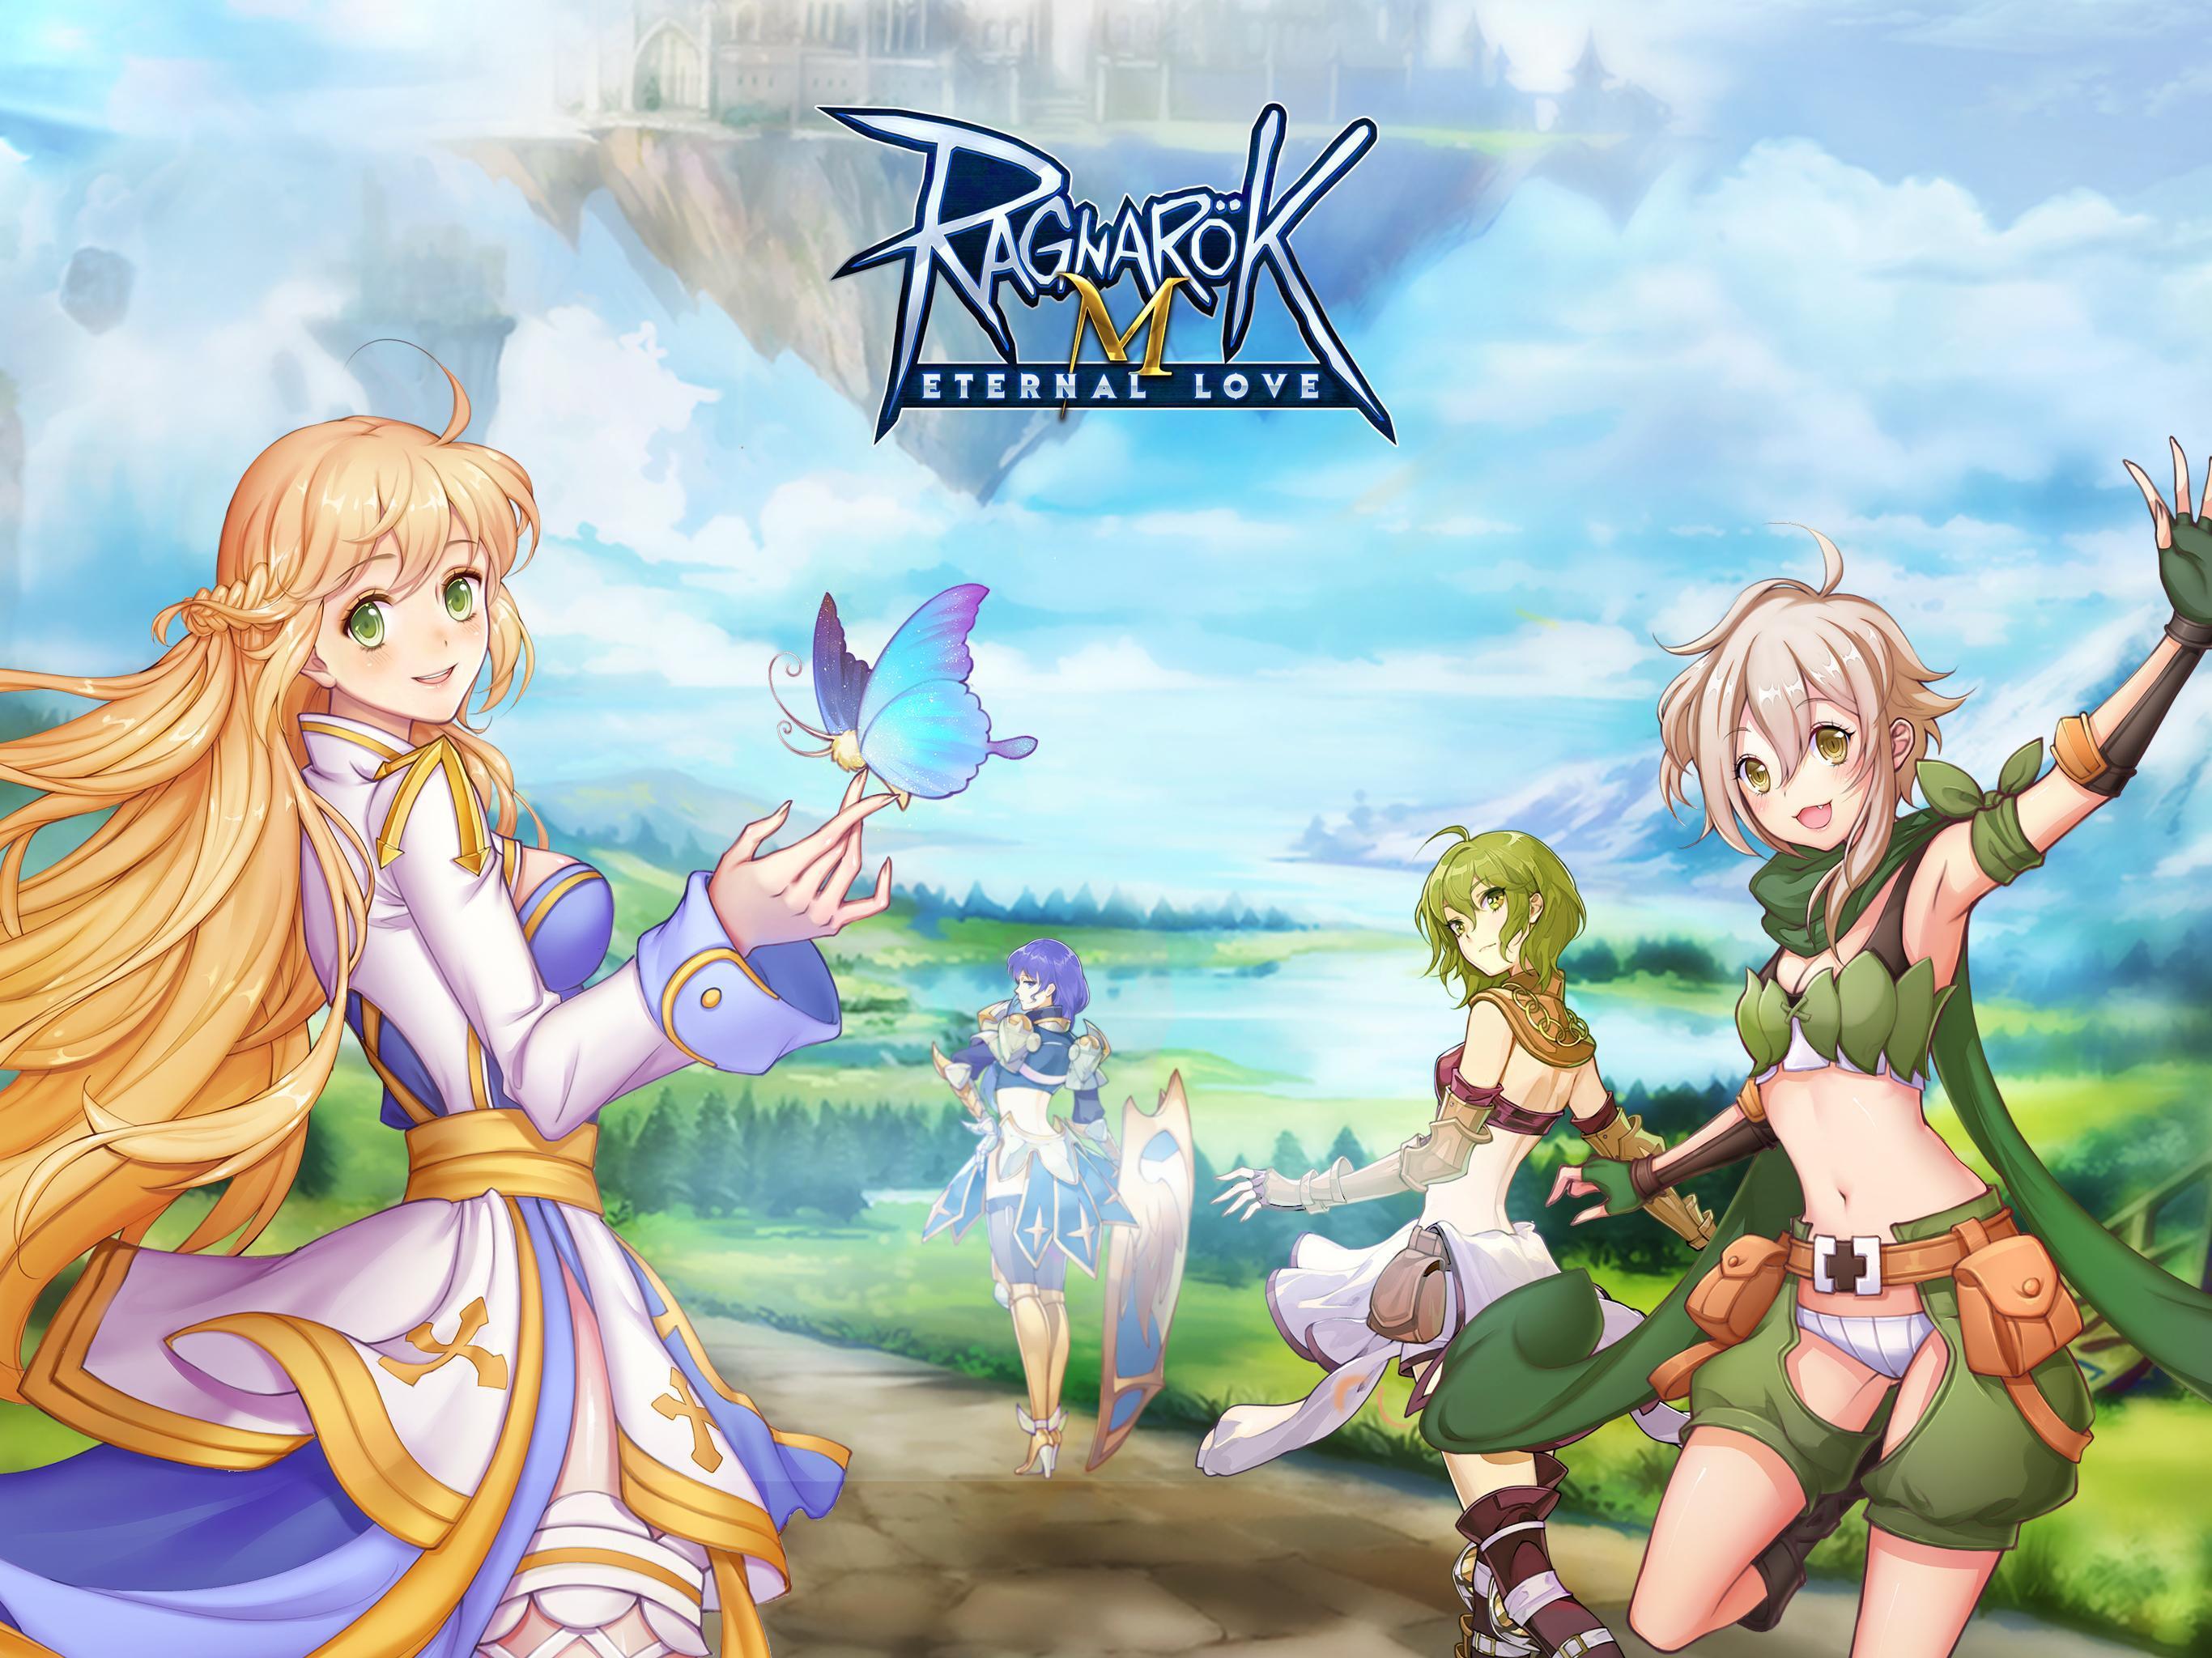 Ragnarok M for Android - APK Download